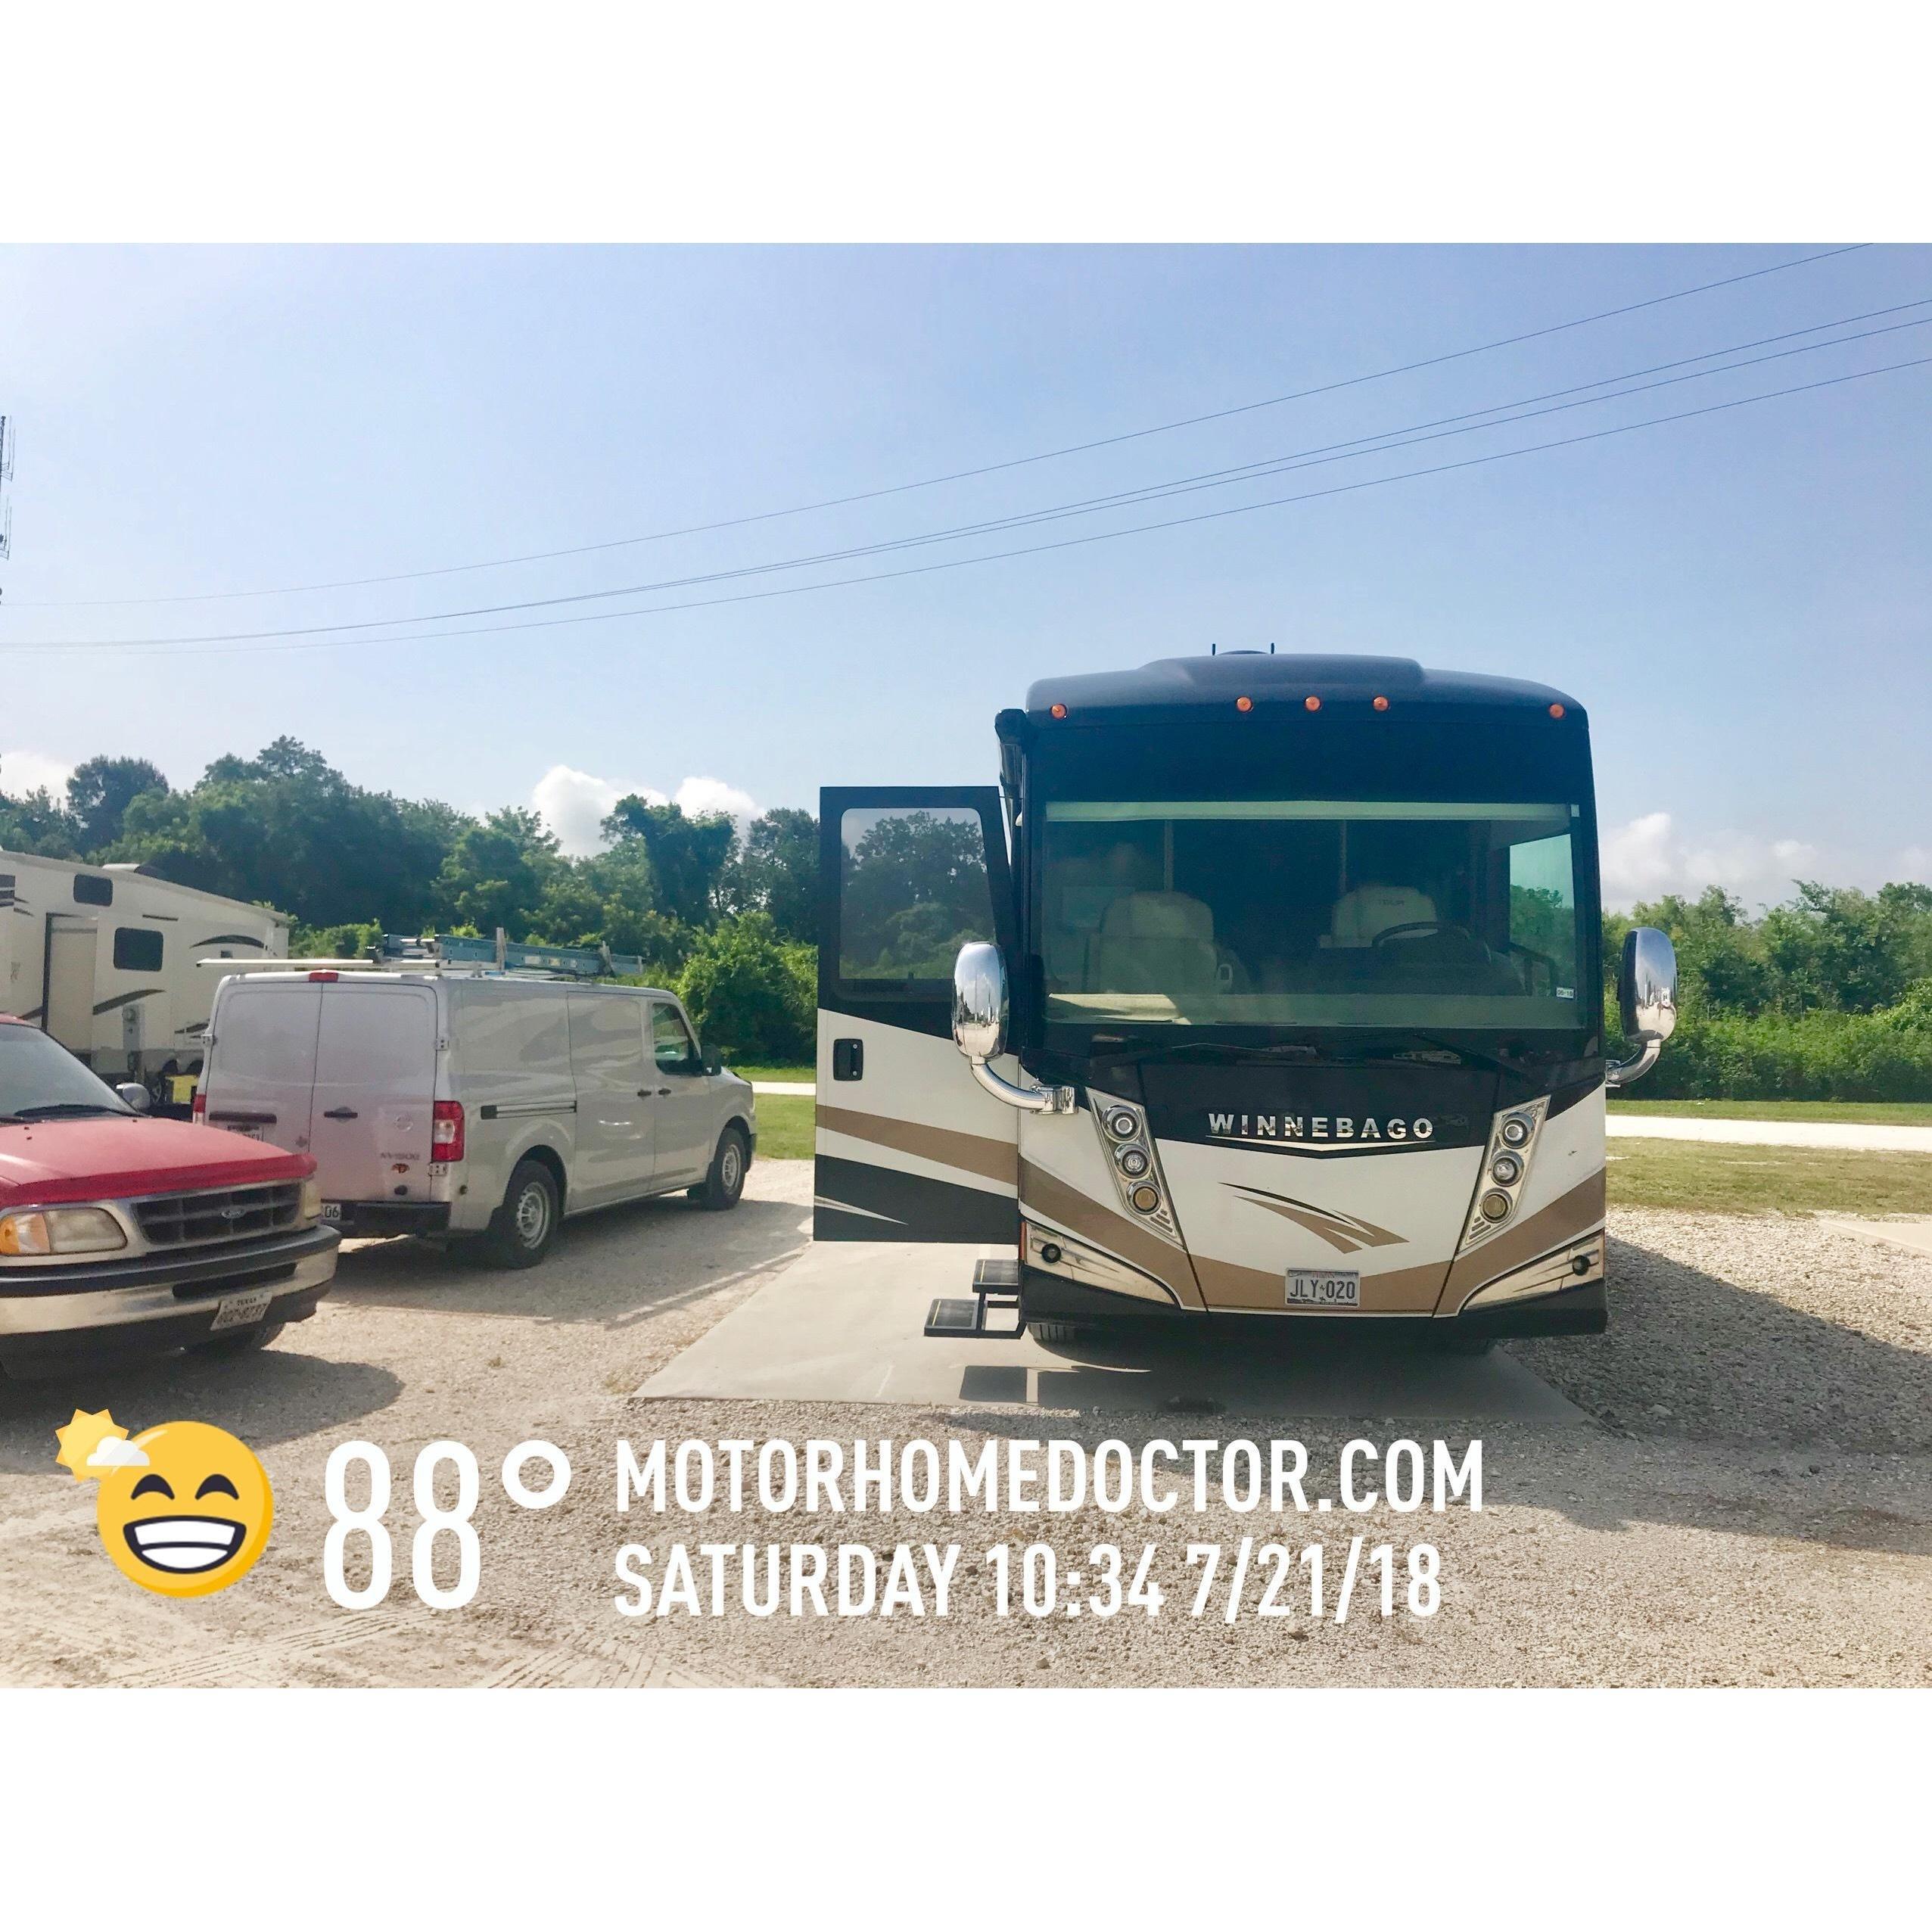 MOTOR HOME DOCTOR Mobile RV Service